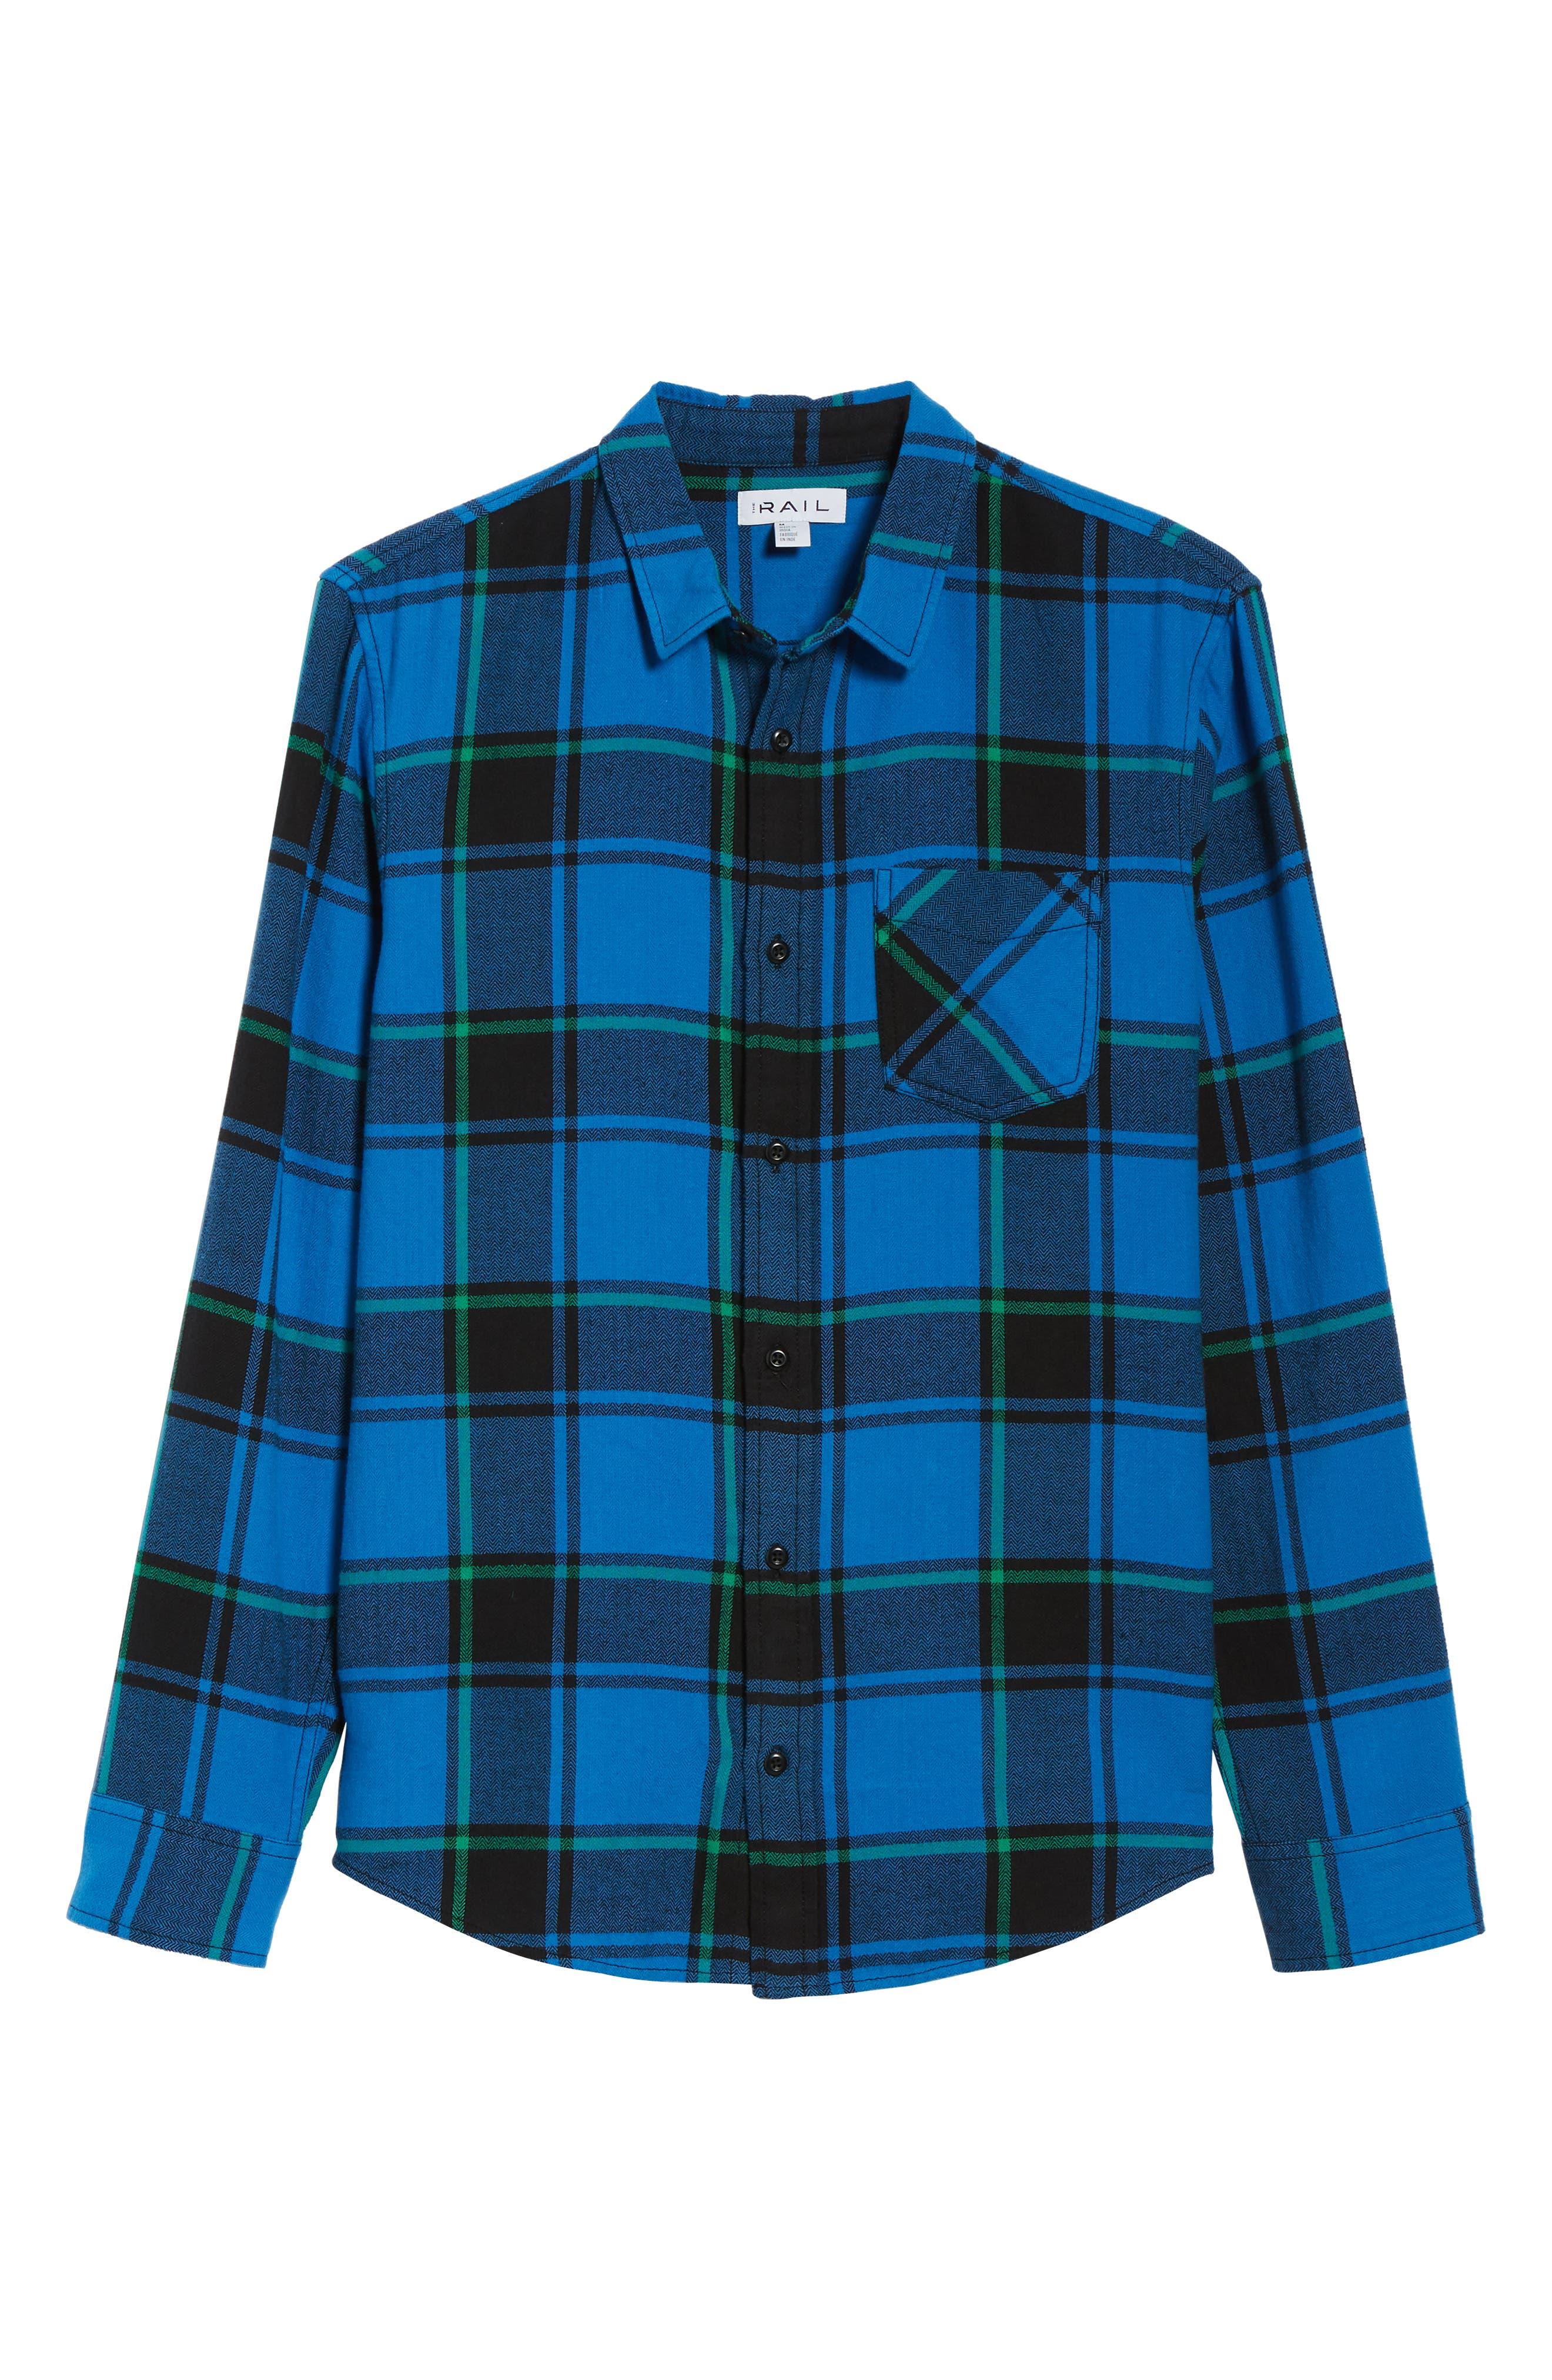 Plaid Flannel Shirt,                             Alternate thumbnail 6, color,                             BLUE BLACK REESE PLAID